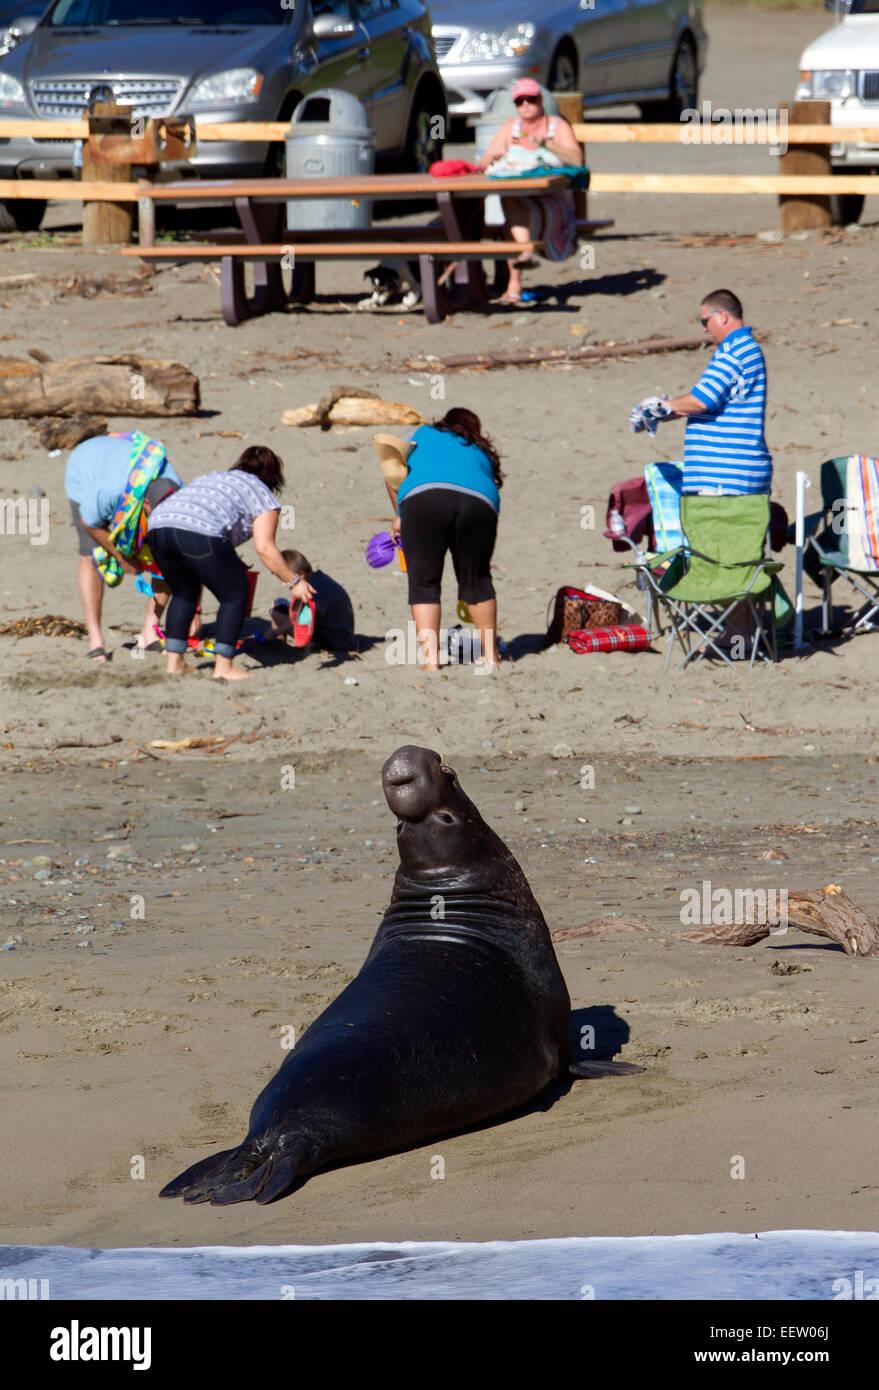 Elephant Seal Bull on Beach - Stock Image